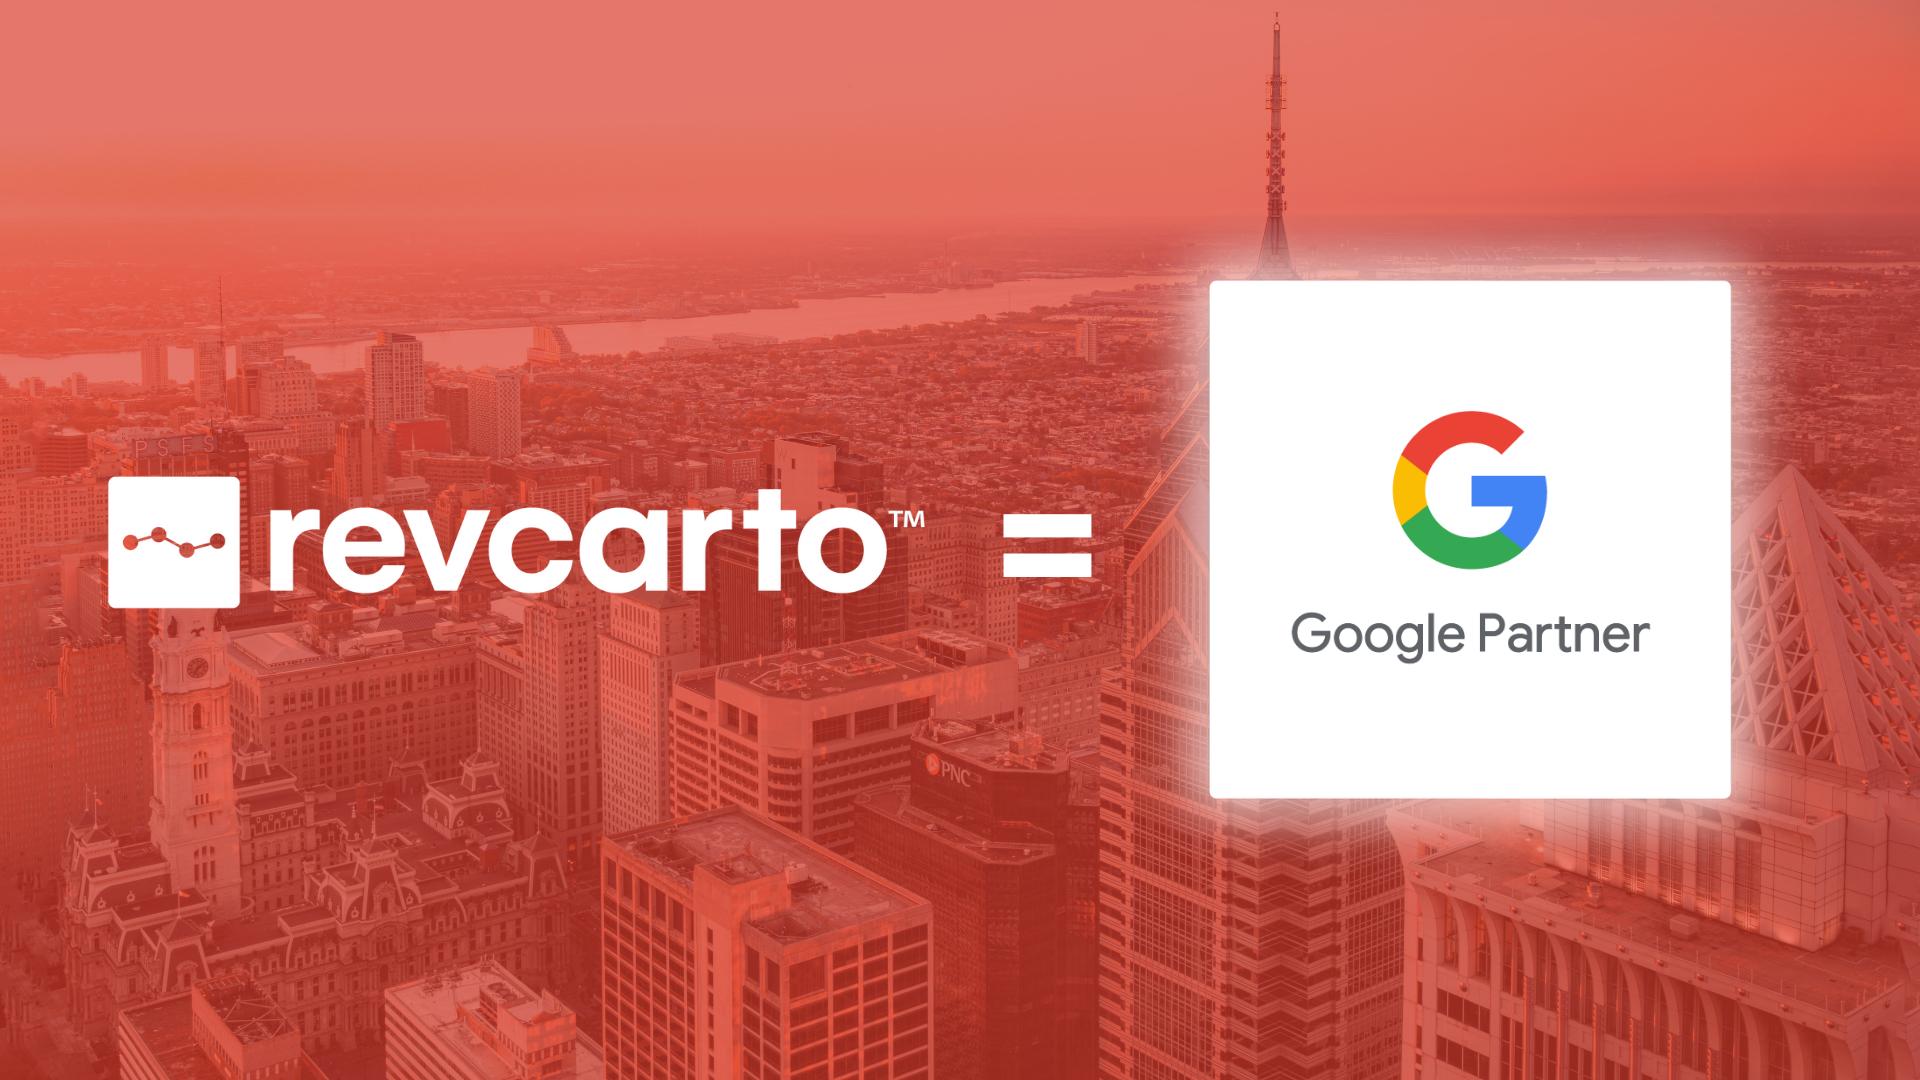 Revcarto Awarded New Google Partner Badge